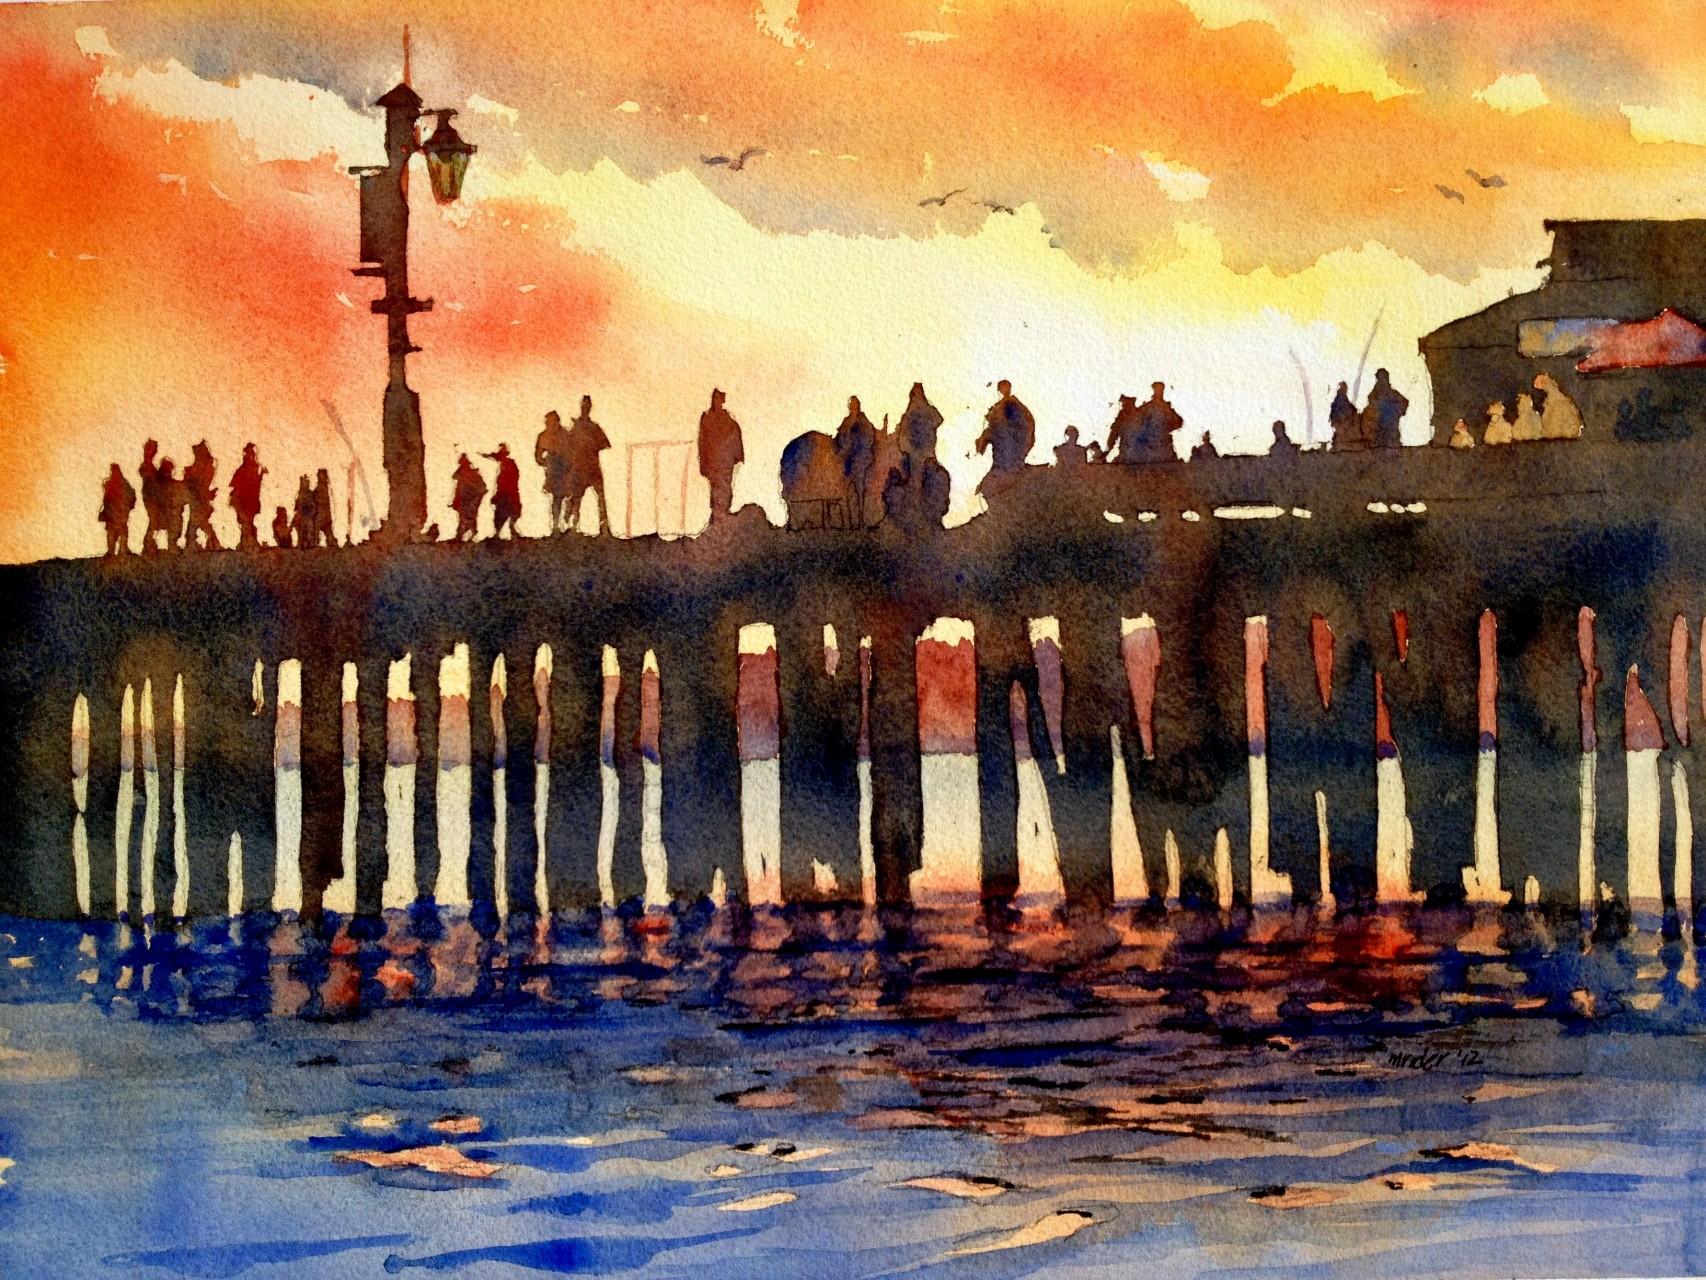 Sunset Over the Santa Barbara Wharf